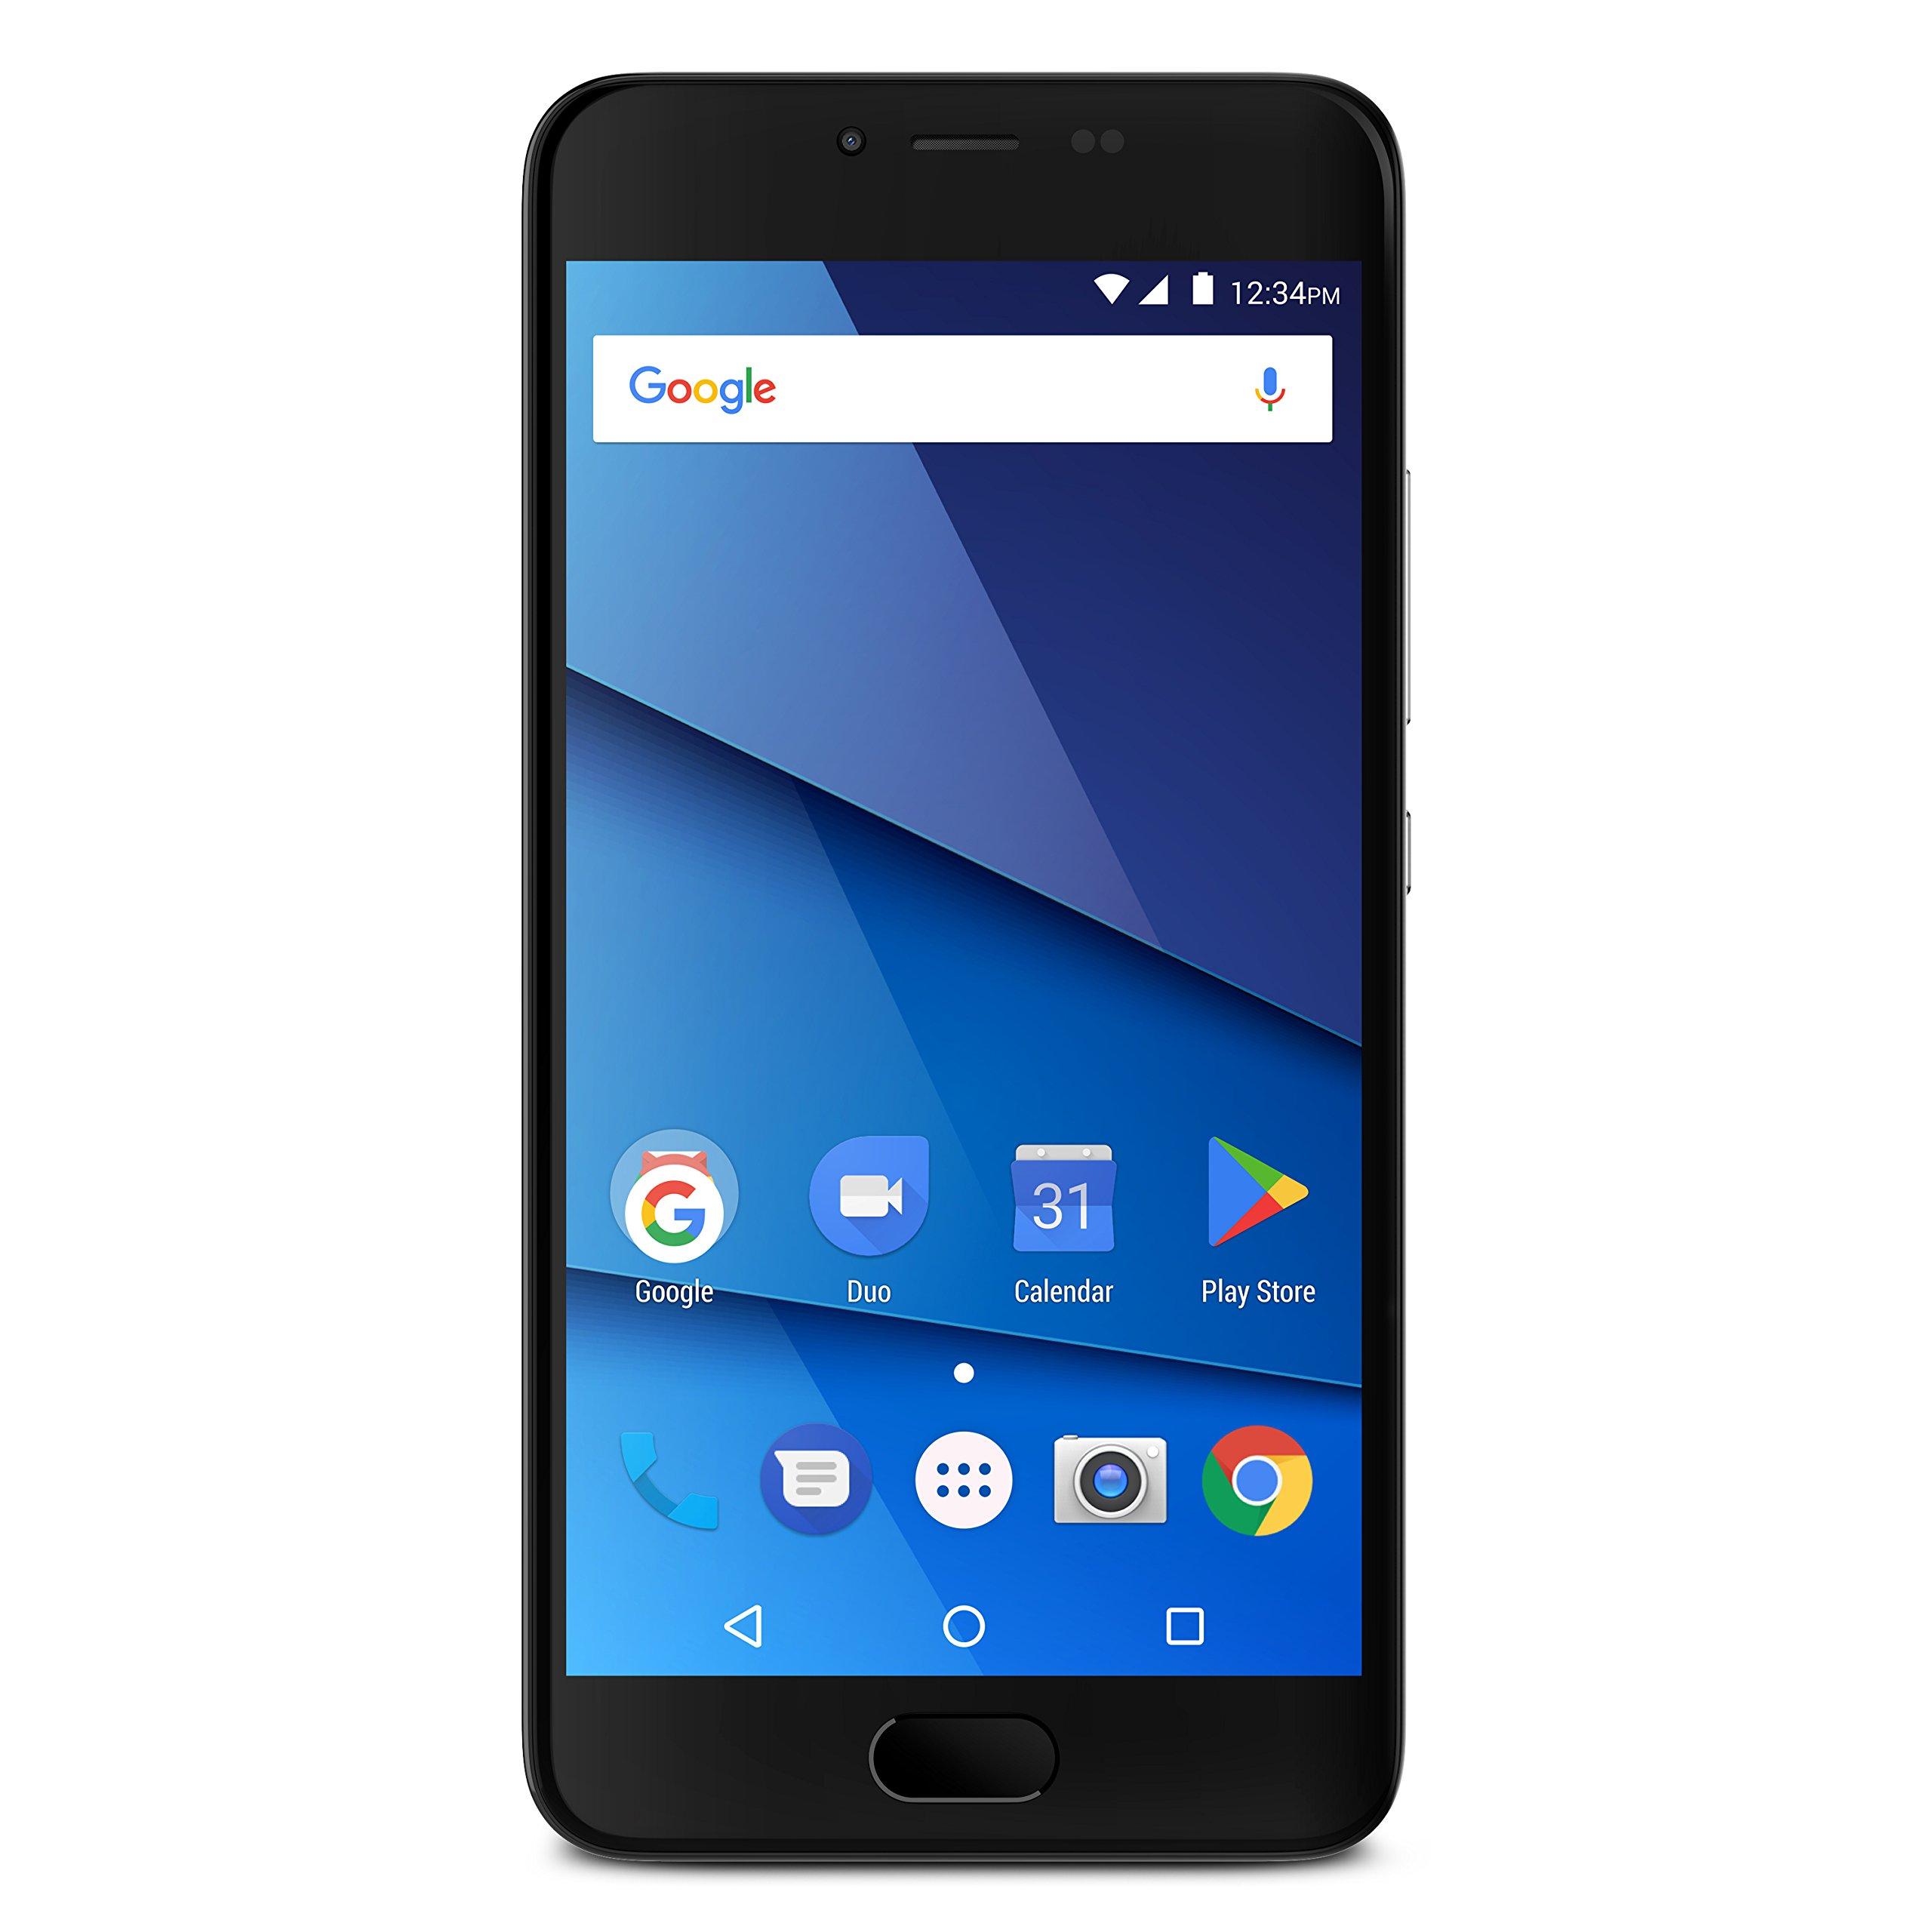 BLU R1 HD 2018 Factory Unlocked Phone - 5.2'' - 16GB - Black (U.S. Warranty) by BLU (Image #6)